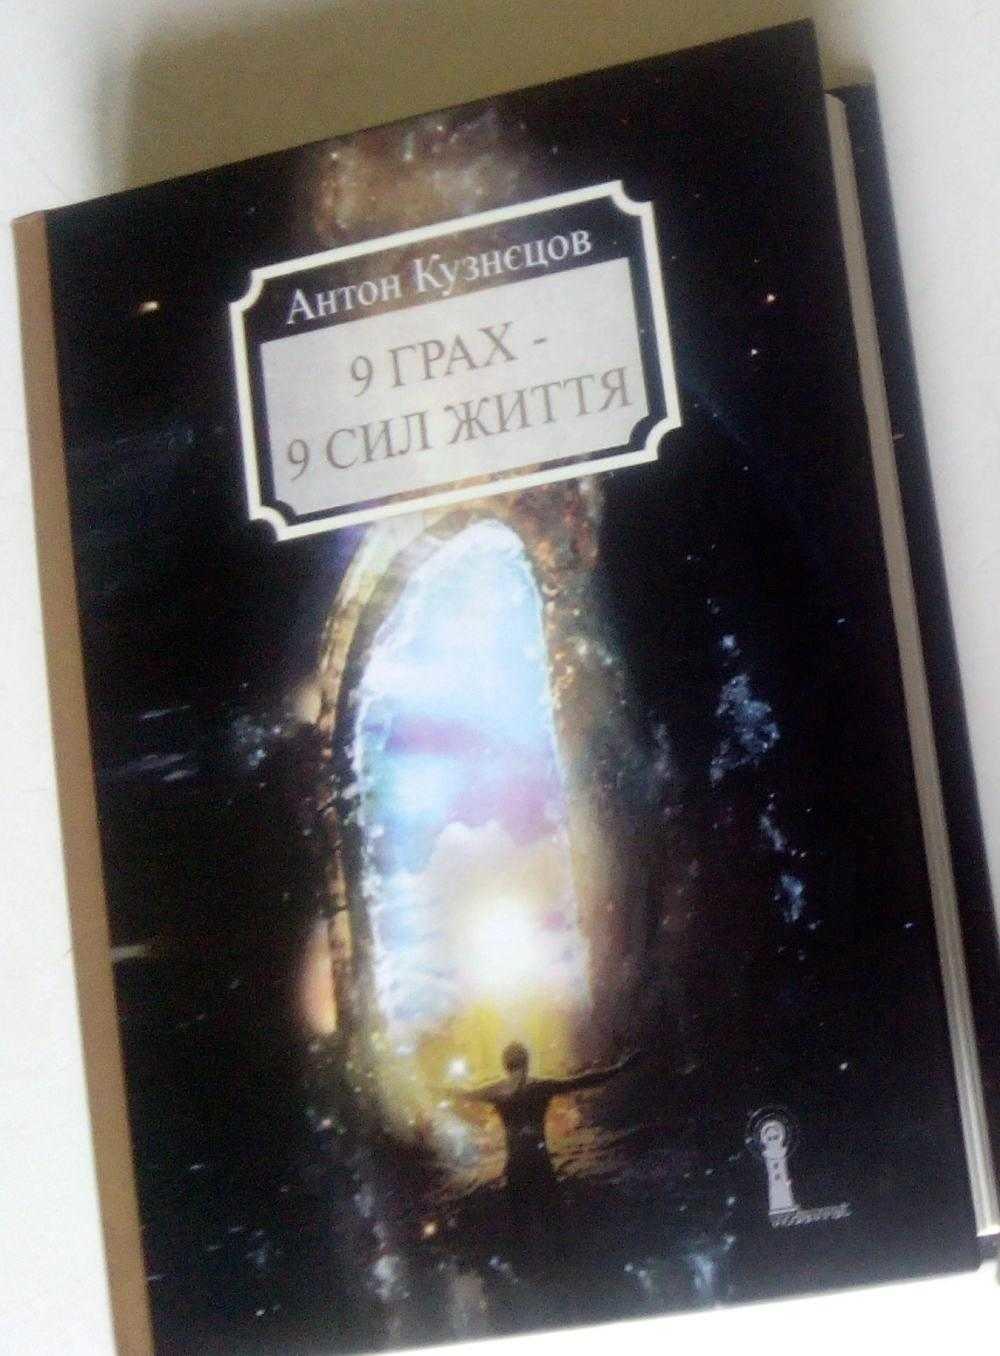 "*** vedavrat-book Антон Кузнецов книга ""9 Грах — 9 Сил життя"" наука Тантра-Джйотіш ***"